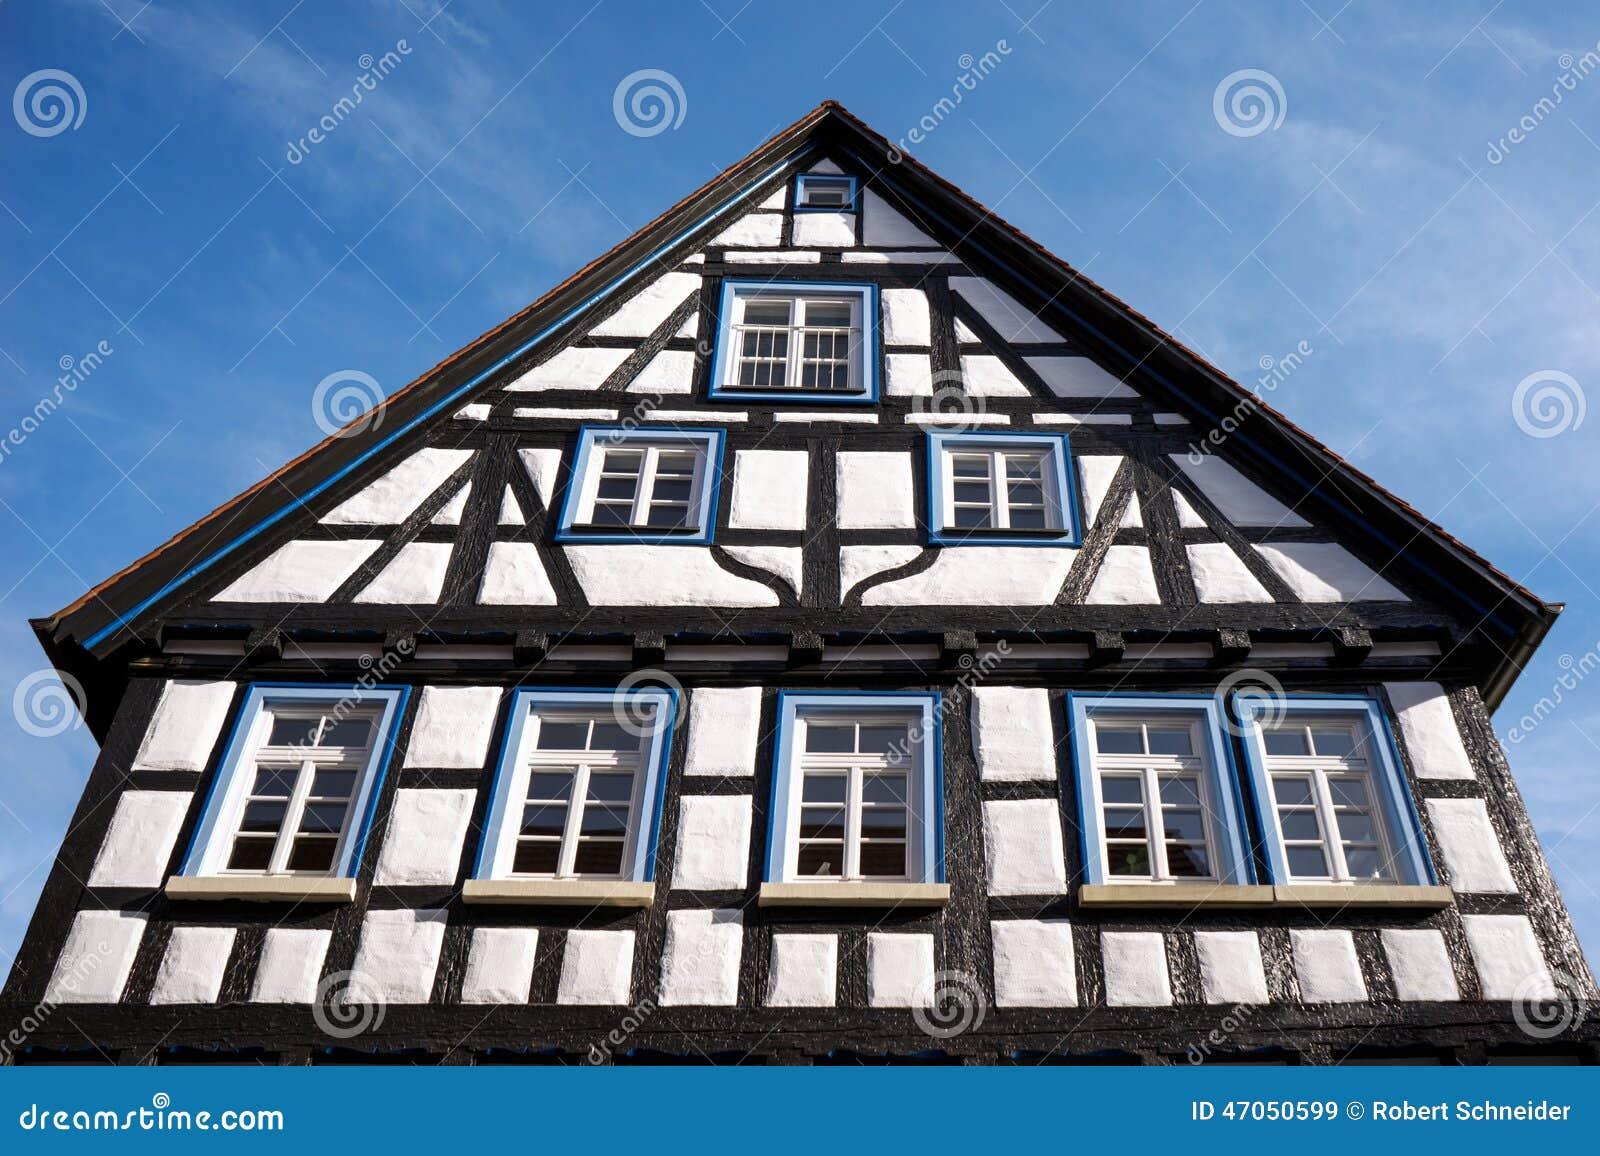 maison colombage photo stock image 47050599. Black Bedroom Furniture Sets. Home Design Ideas